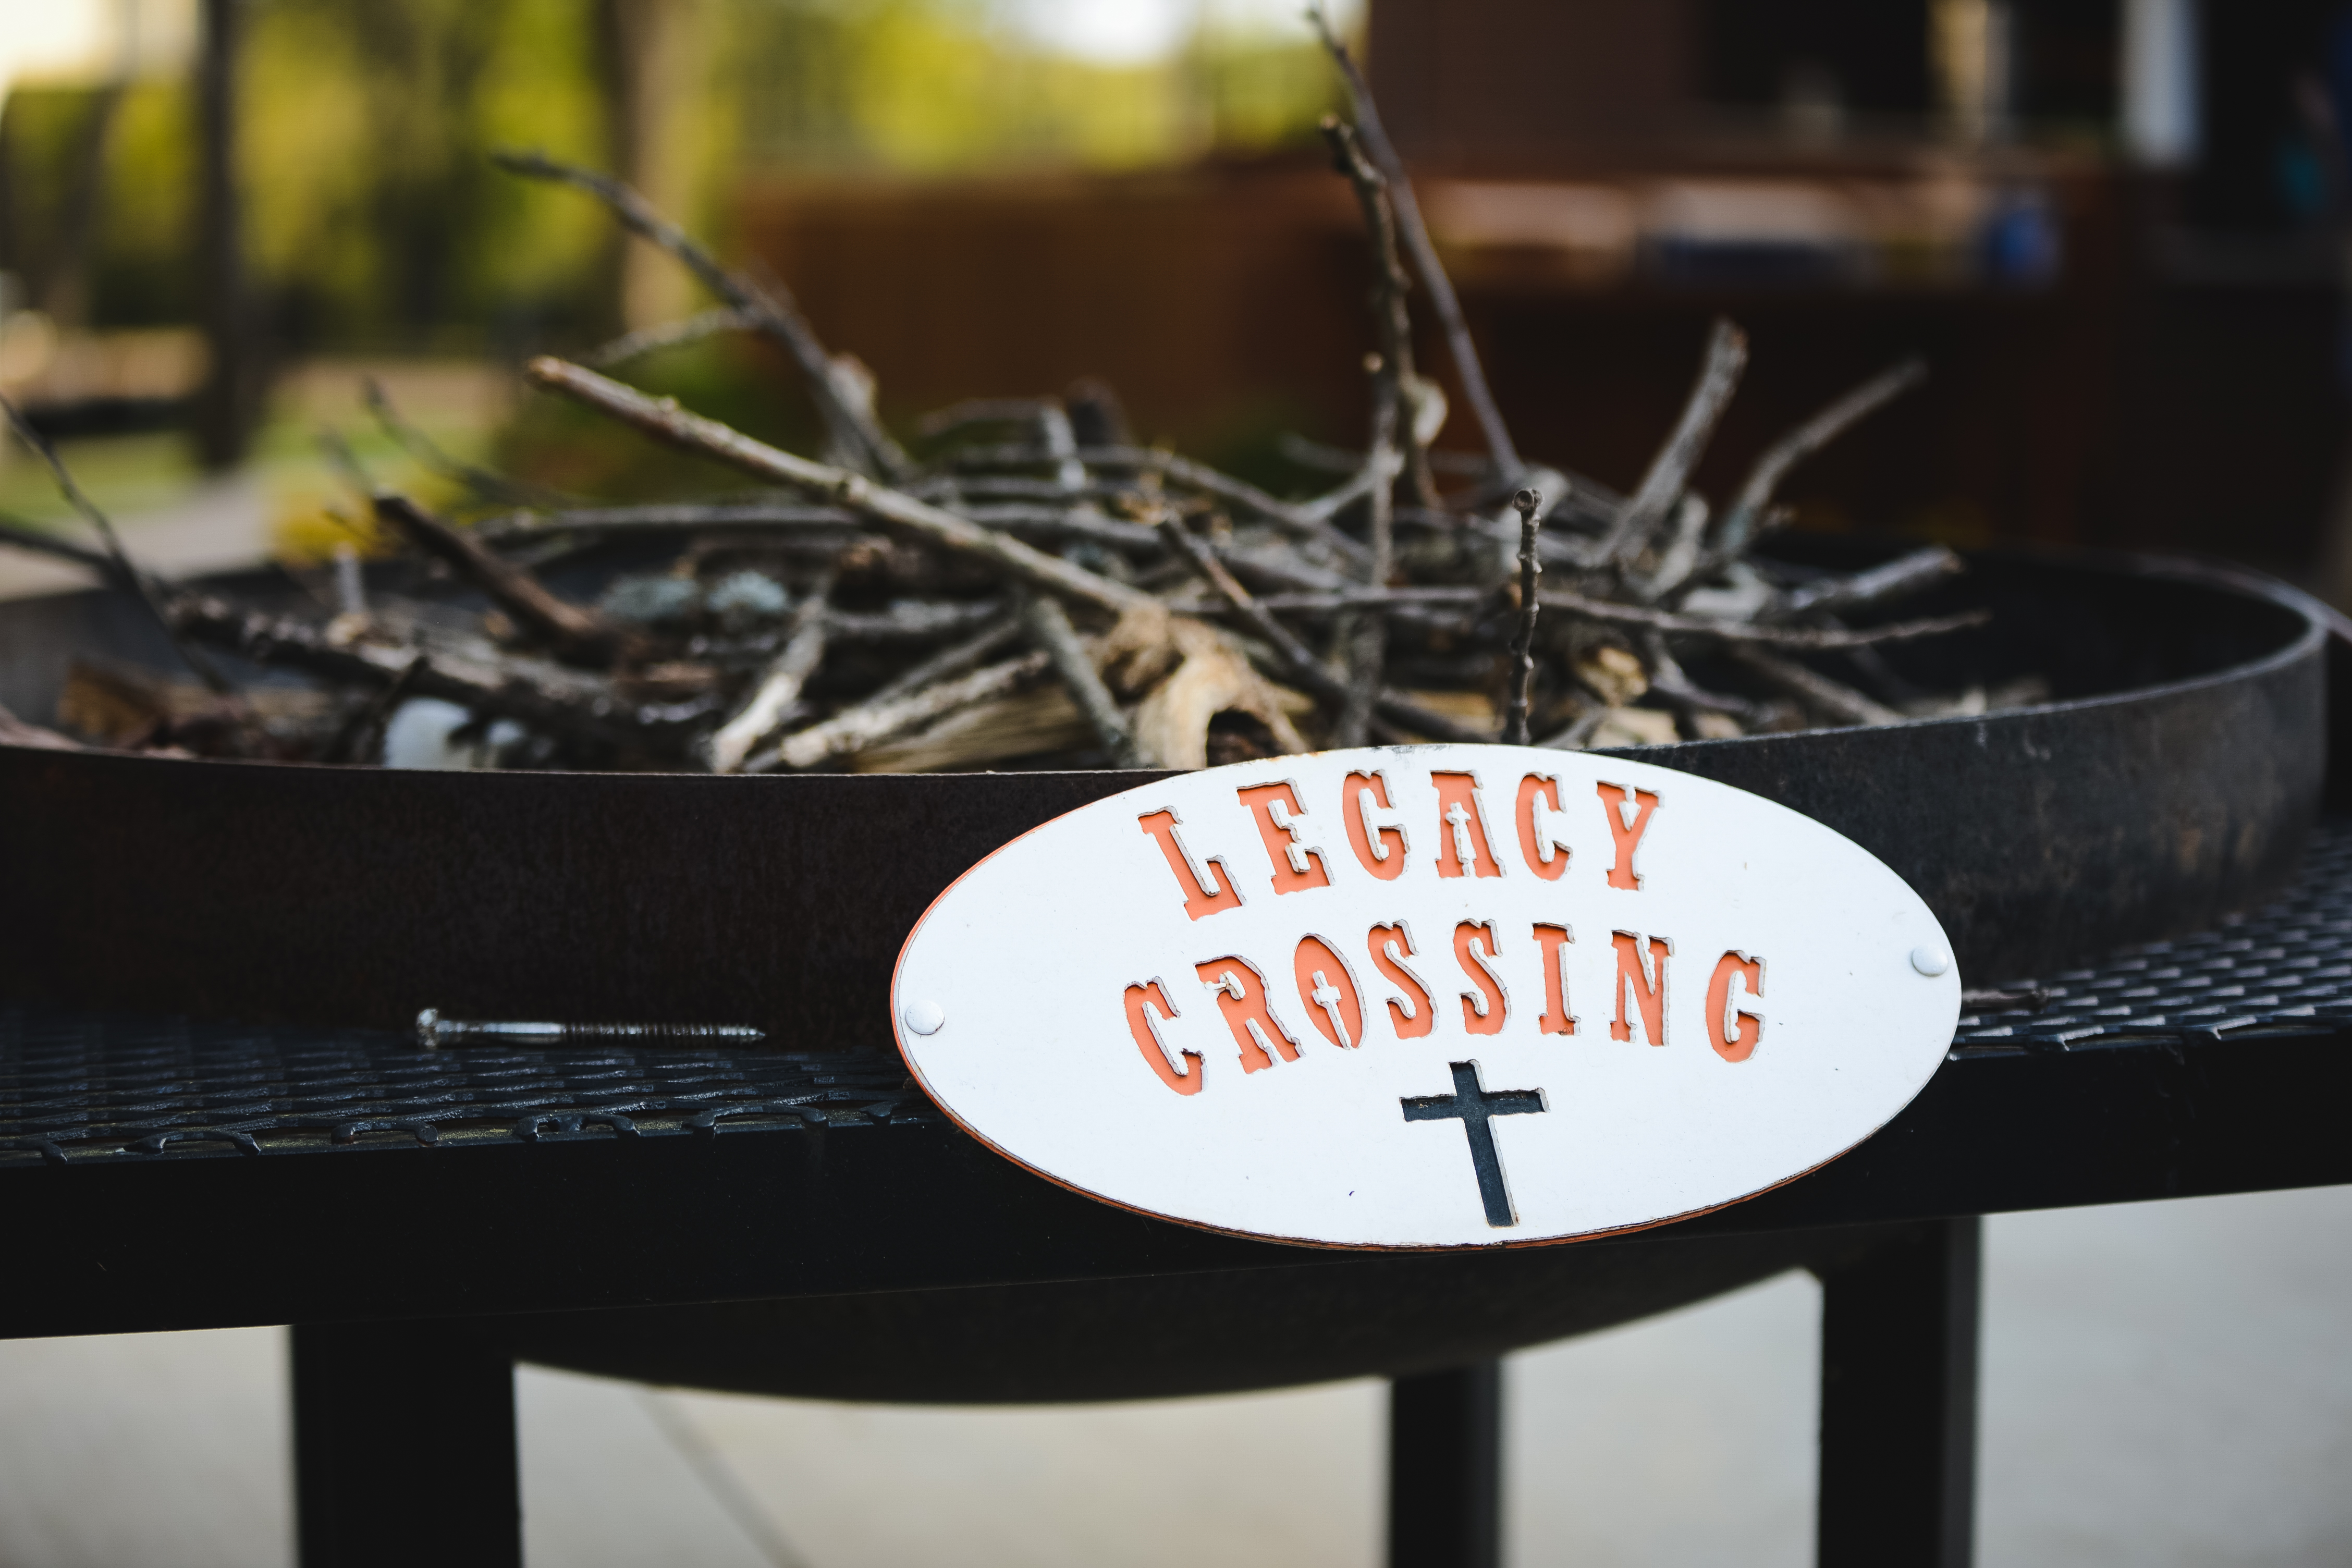 LEGACY CROSSING